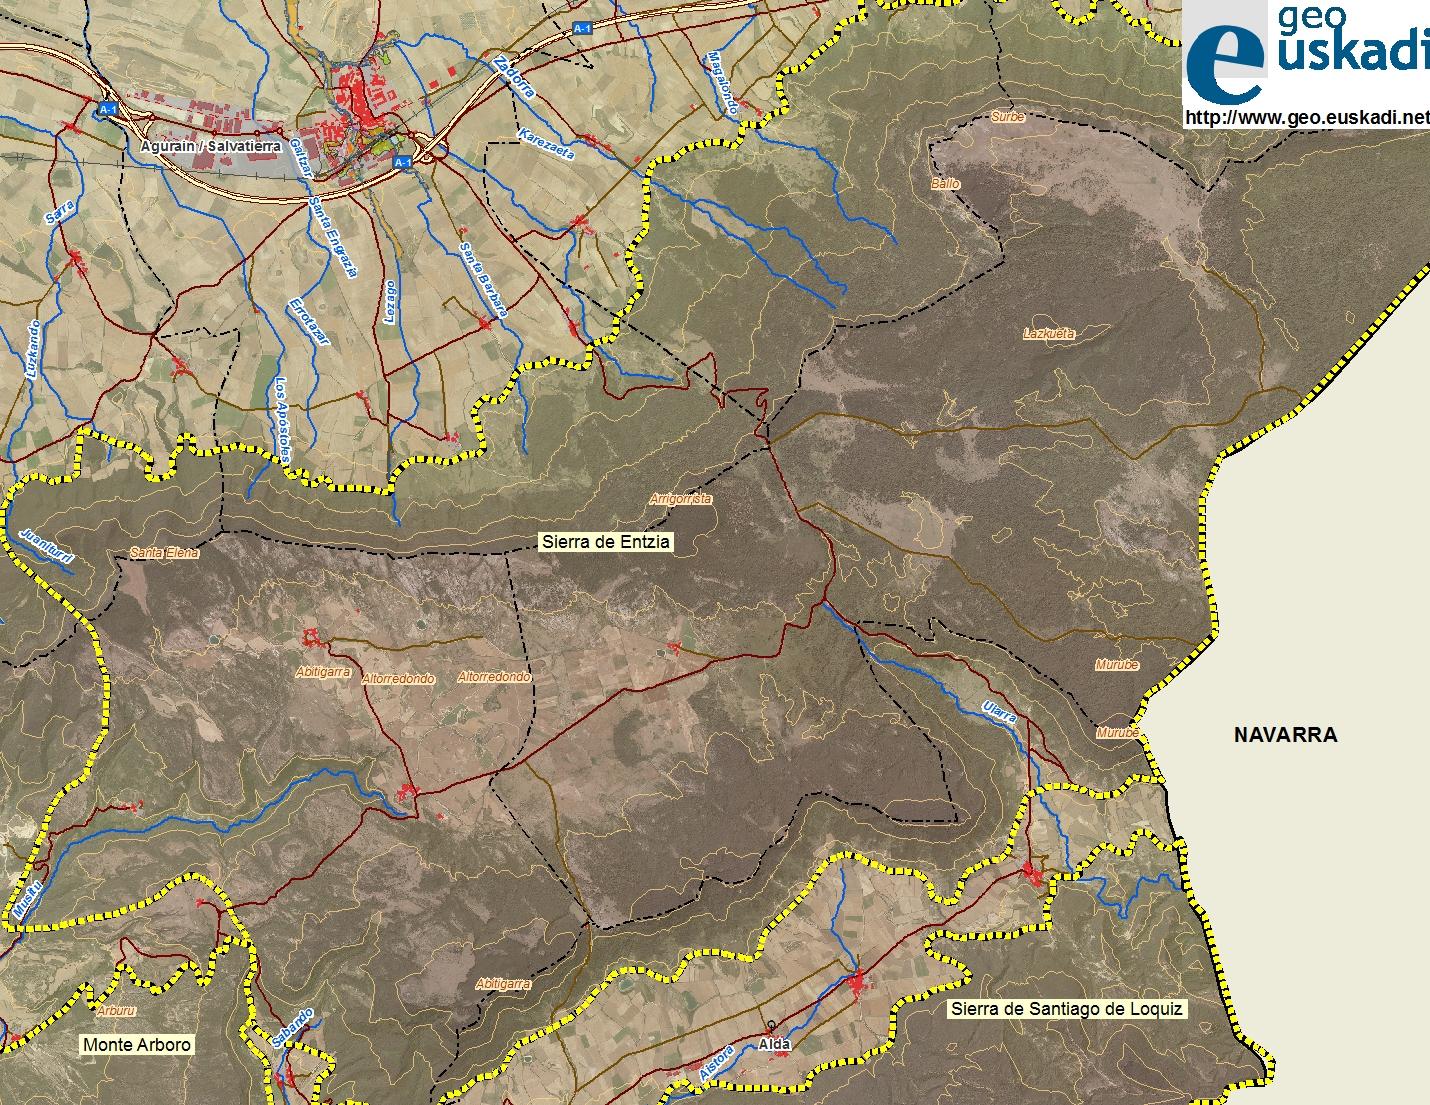 gobierno_vasco_presenta_regulacion_espacios_naturales_sierra_entzia.jpg